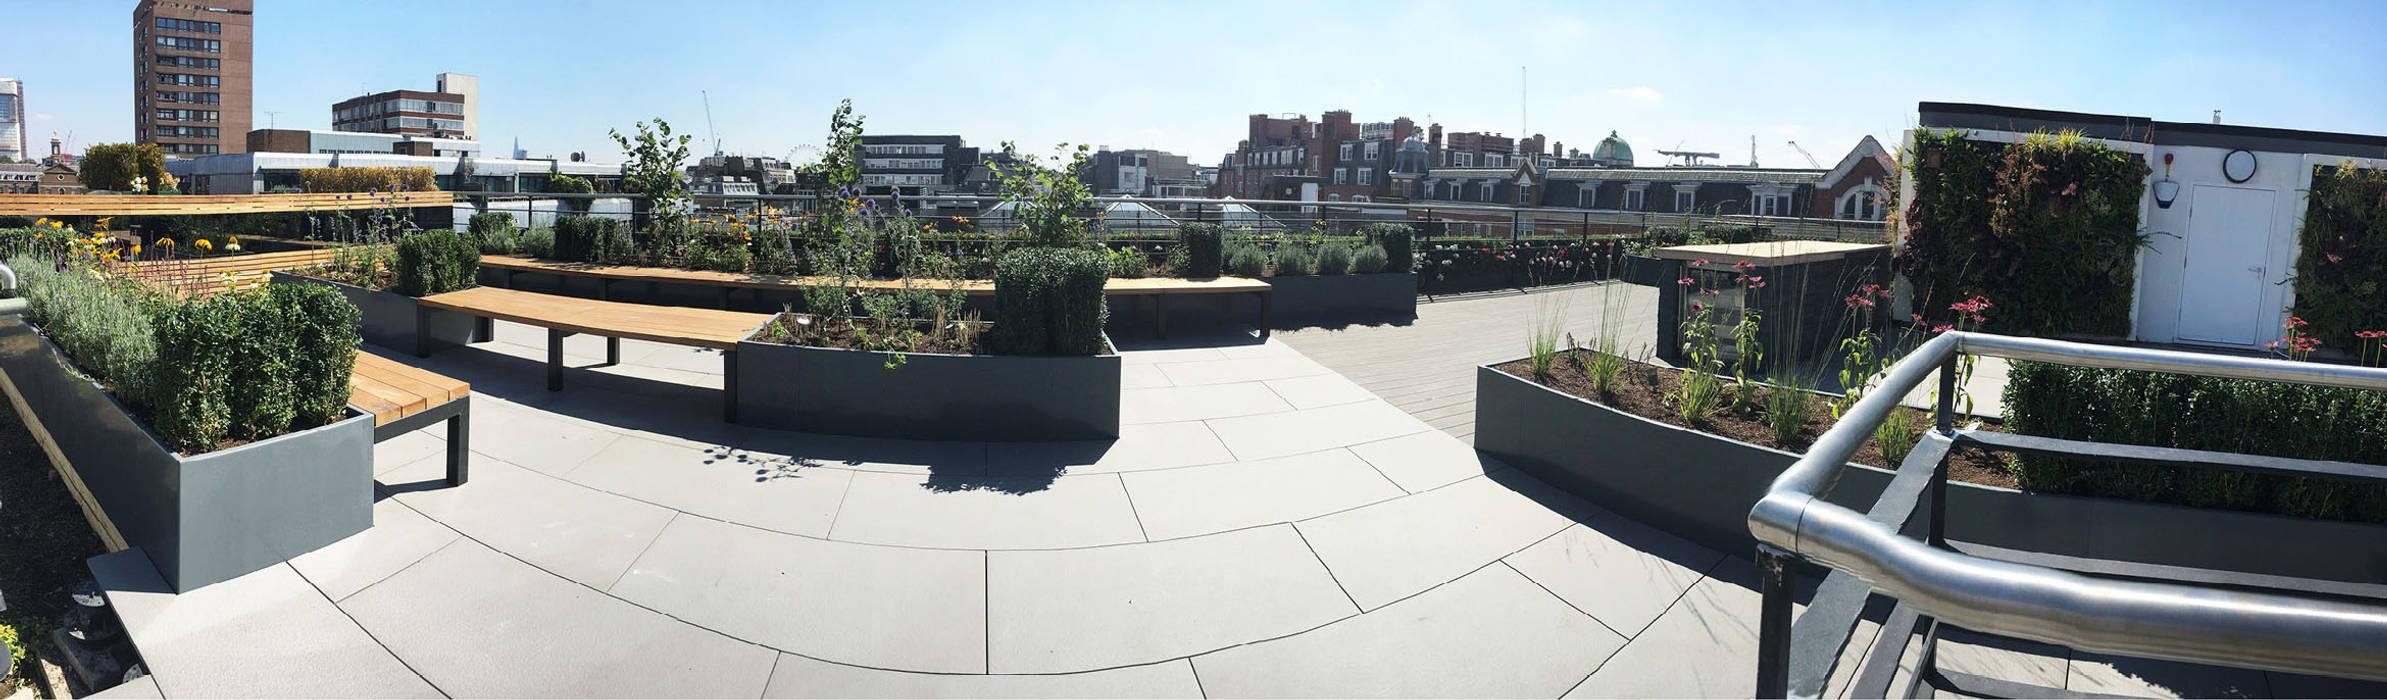 Ganton Street Roof Terrace London:  Commercial Spaces by Aralia